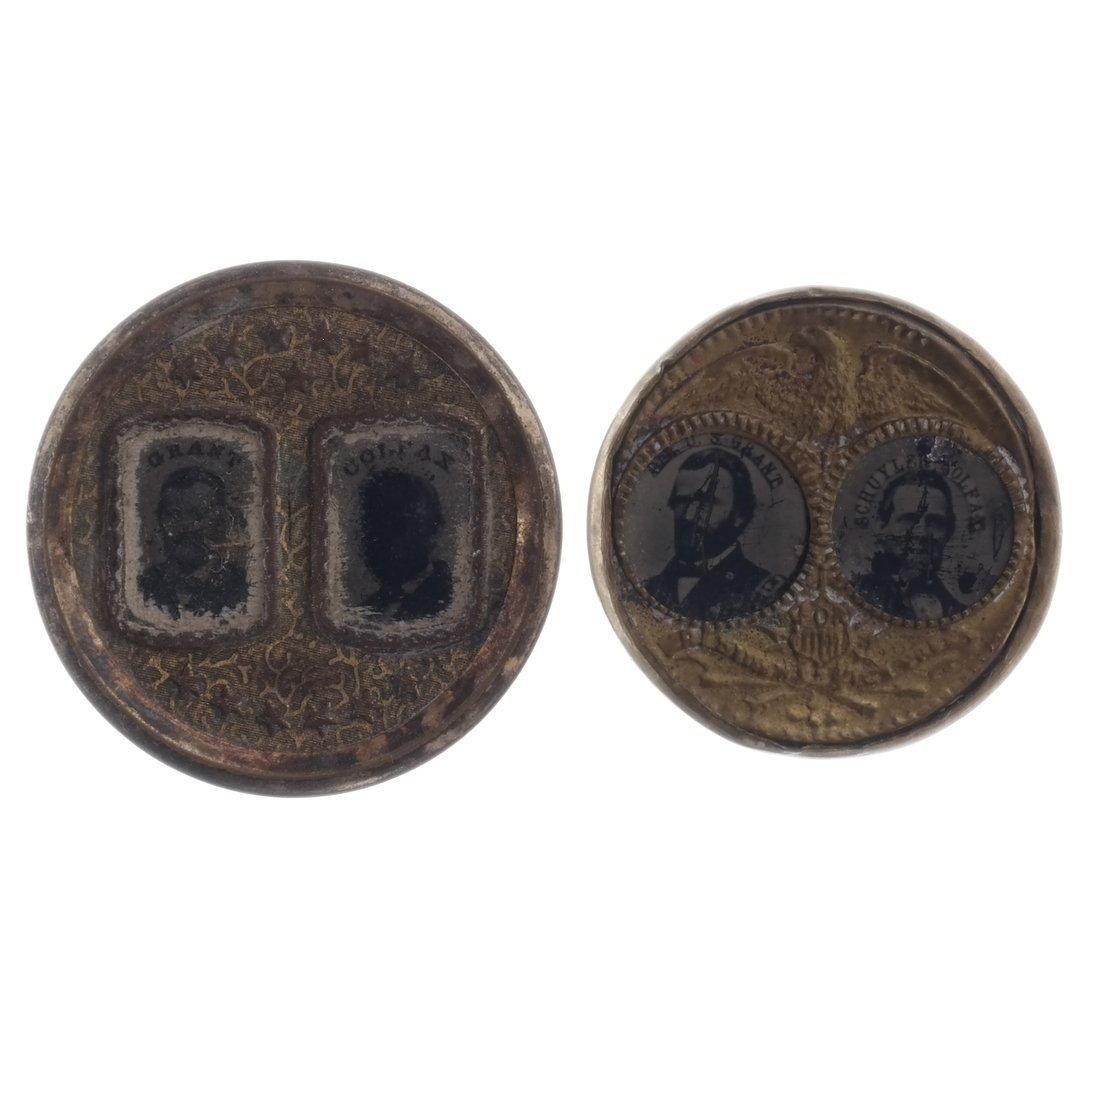 Grant & Colfax Two 1868 Jugate Ferrotypes